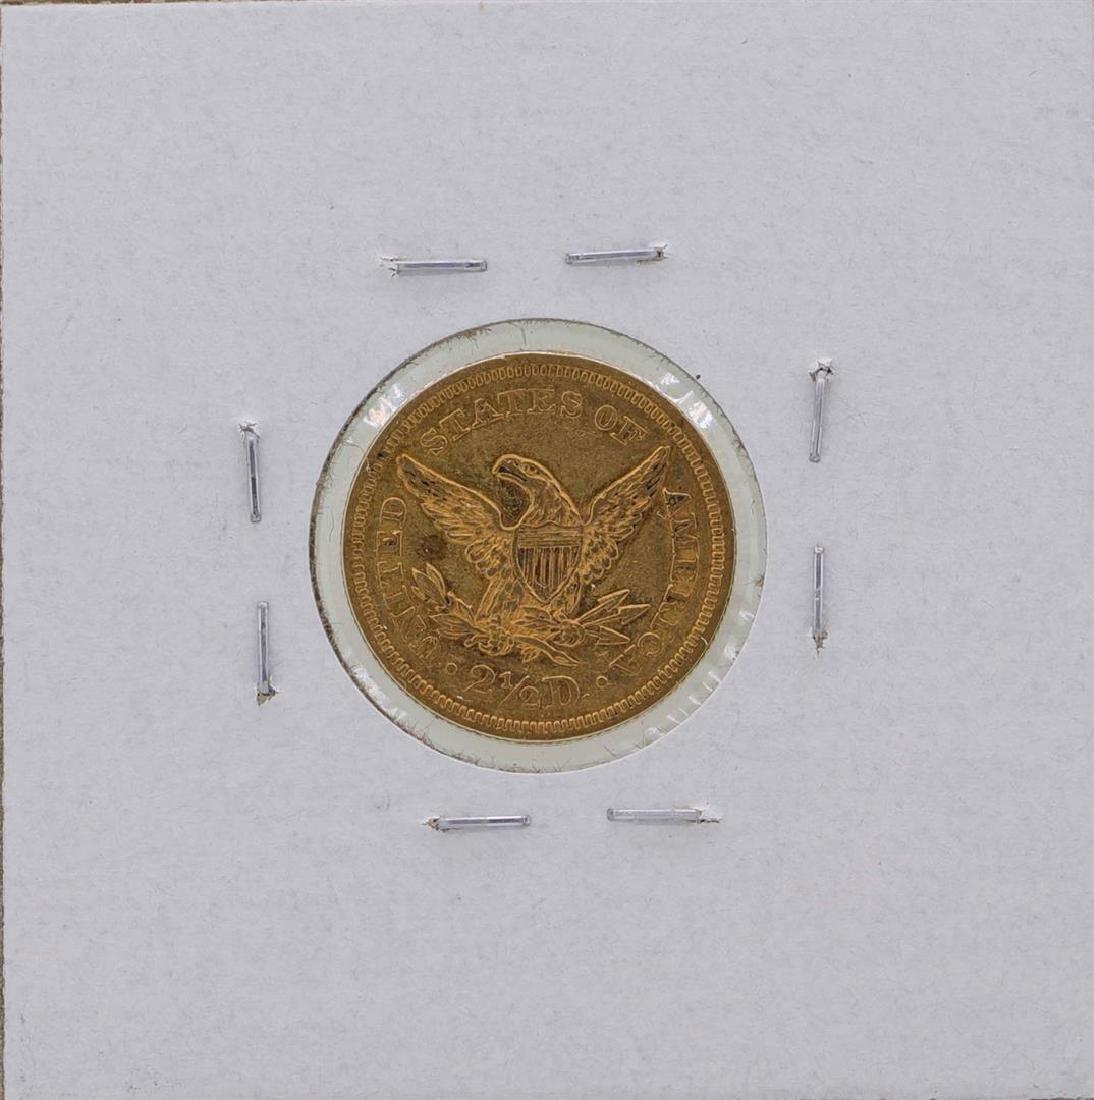 1854 $2 1/2 Liberty Head Quarter Eagle Gold Coin - 2